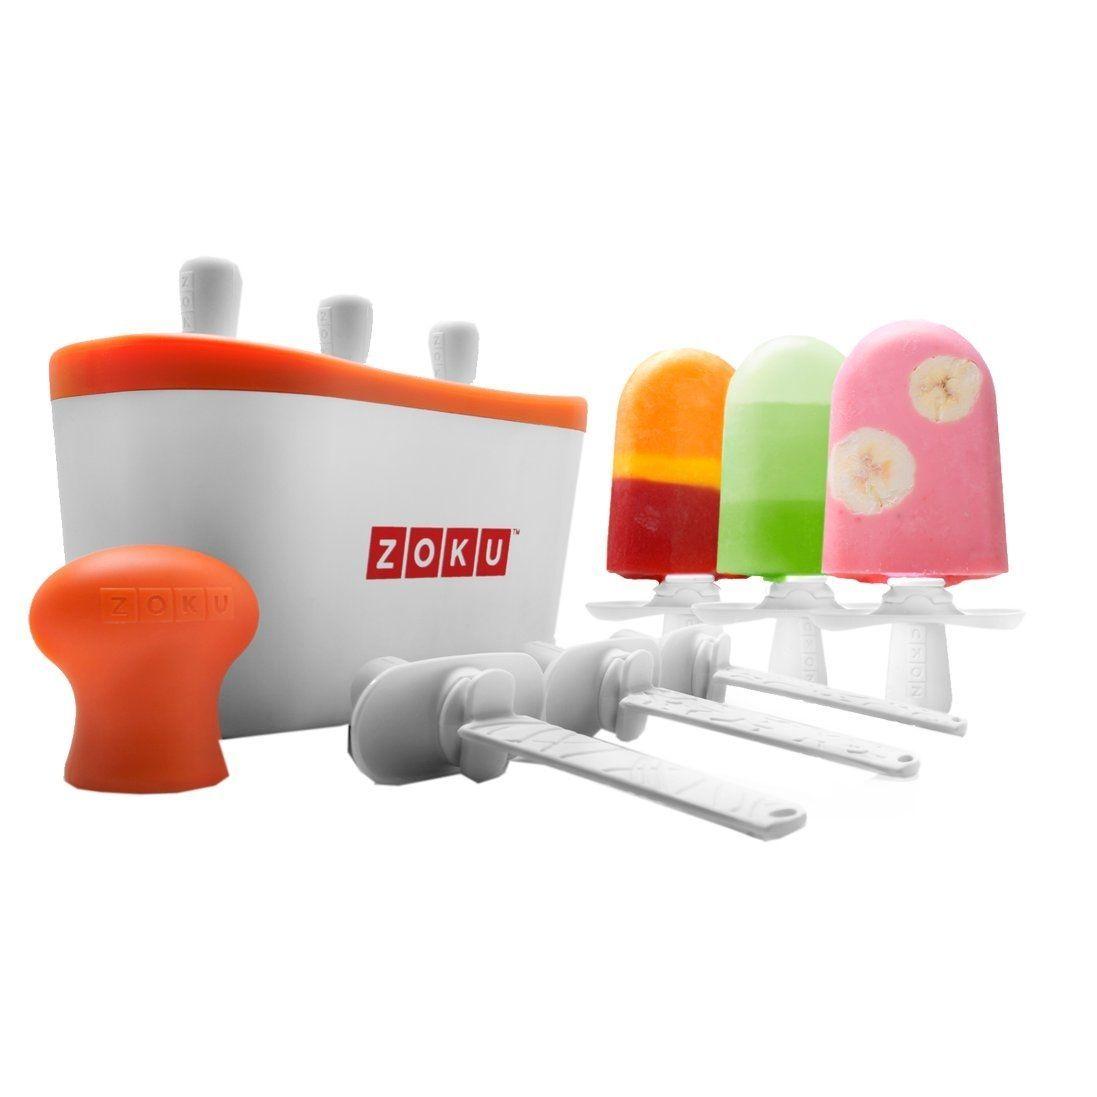 ZOKU Quick la machine à glace